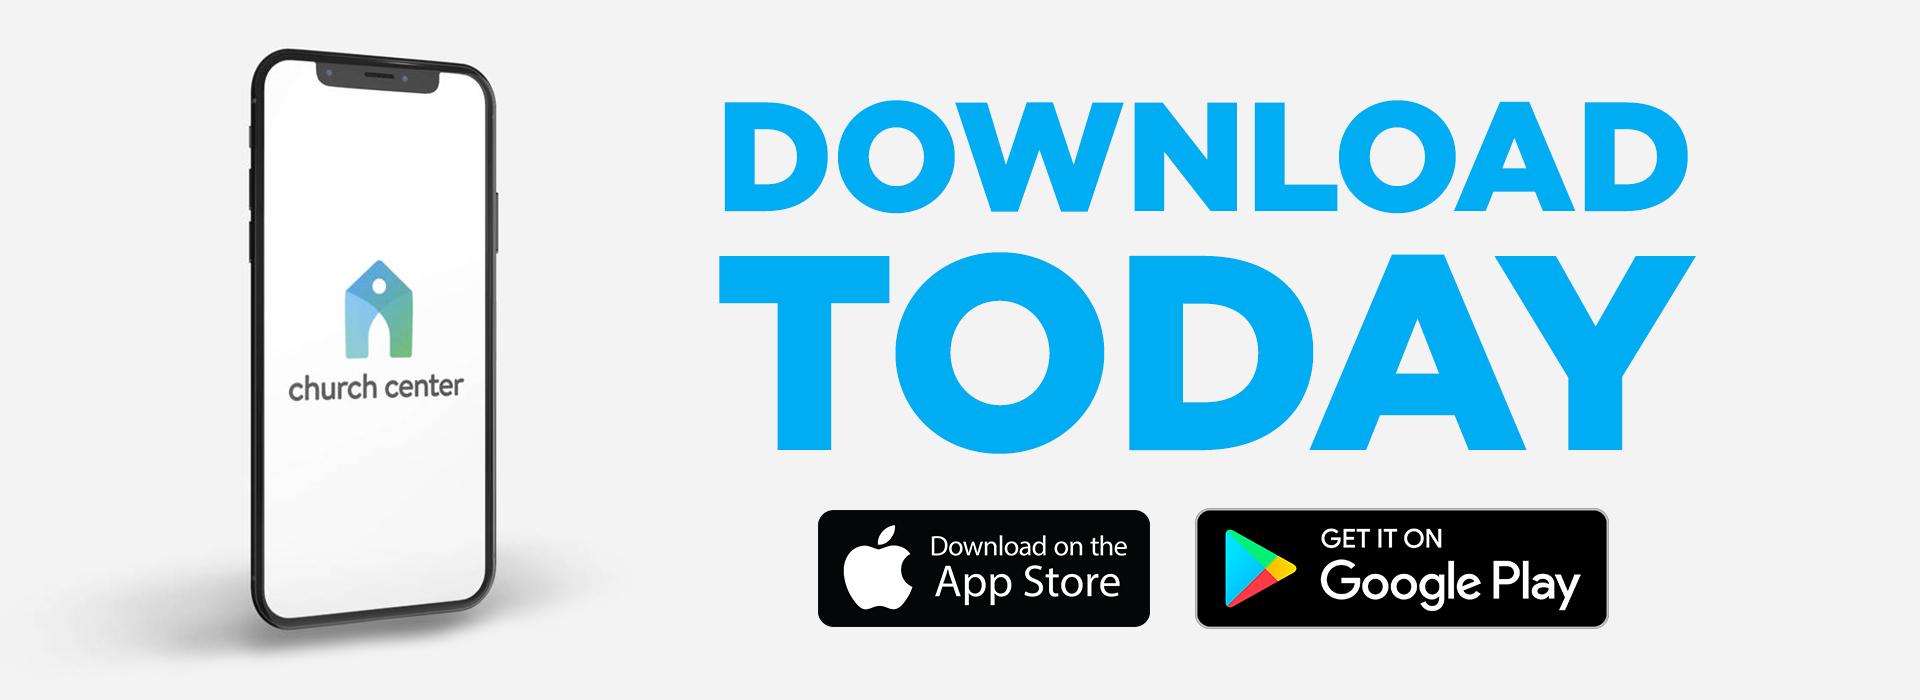 DownloadToday.jpg